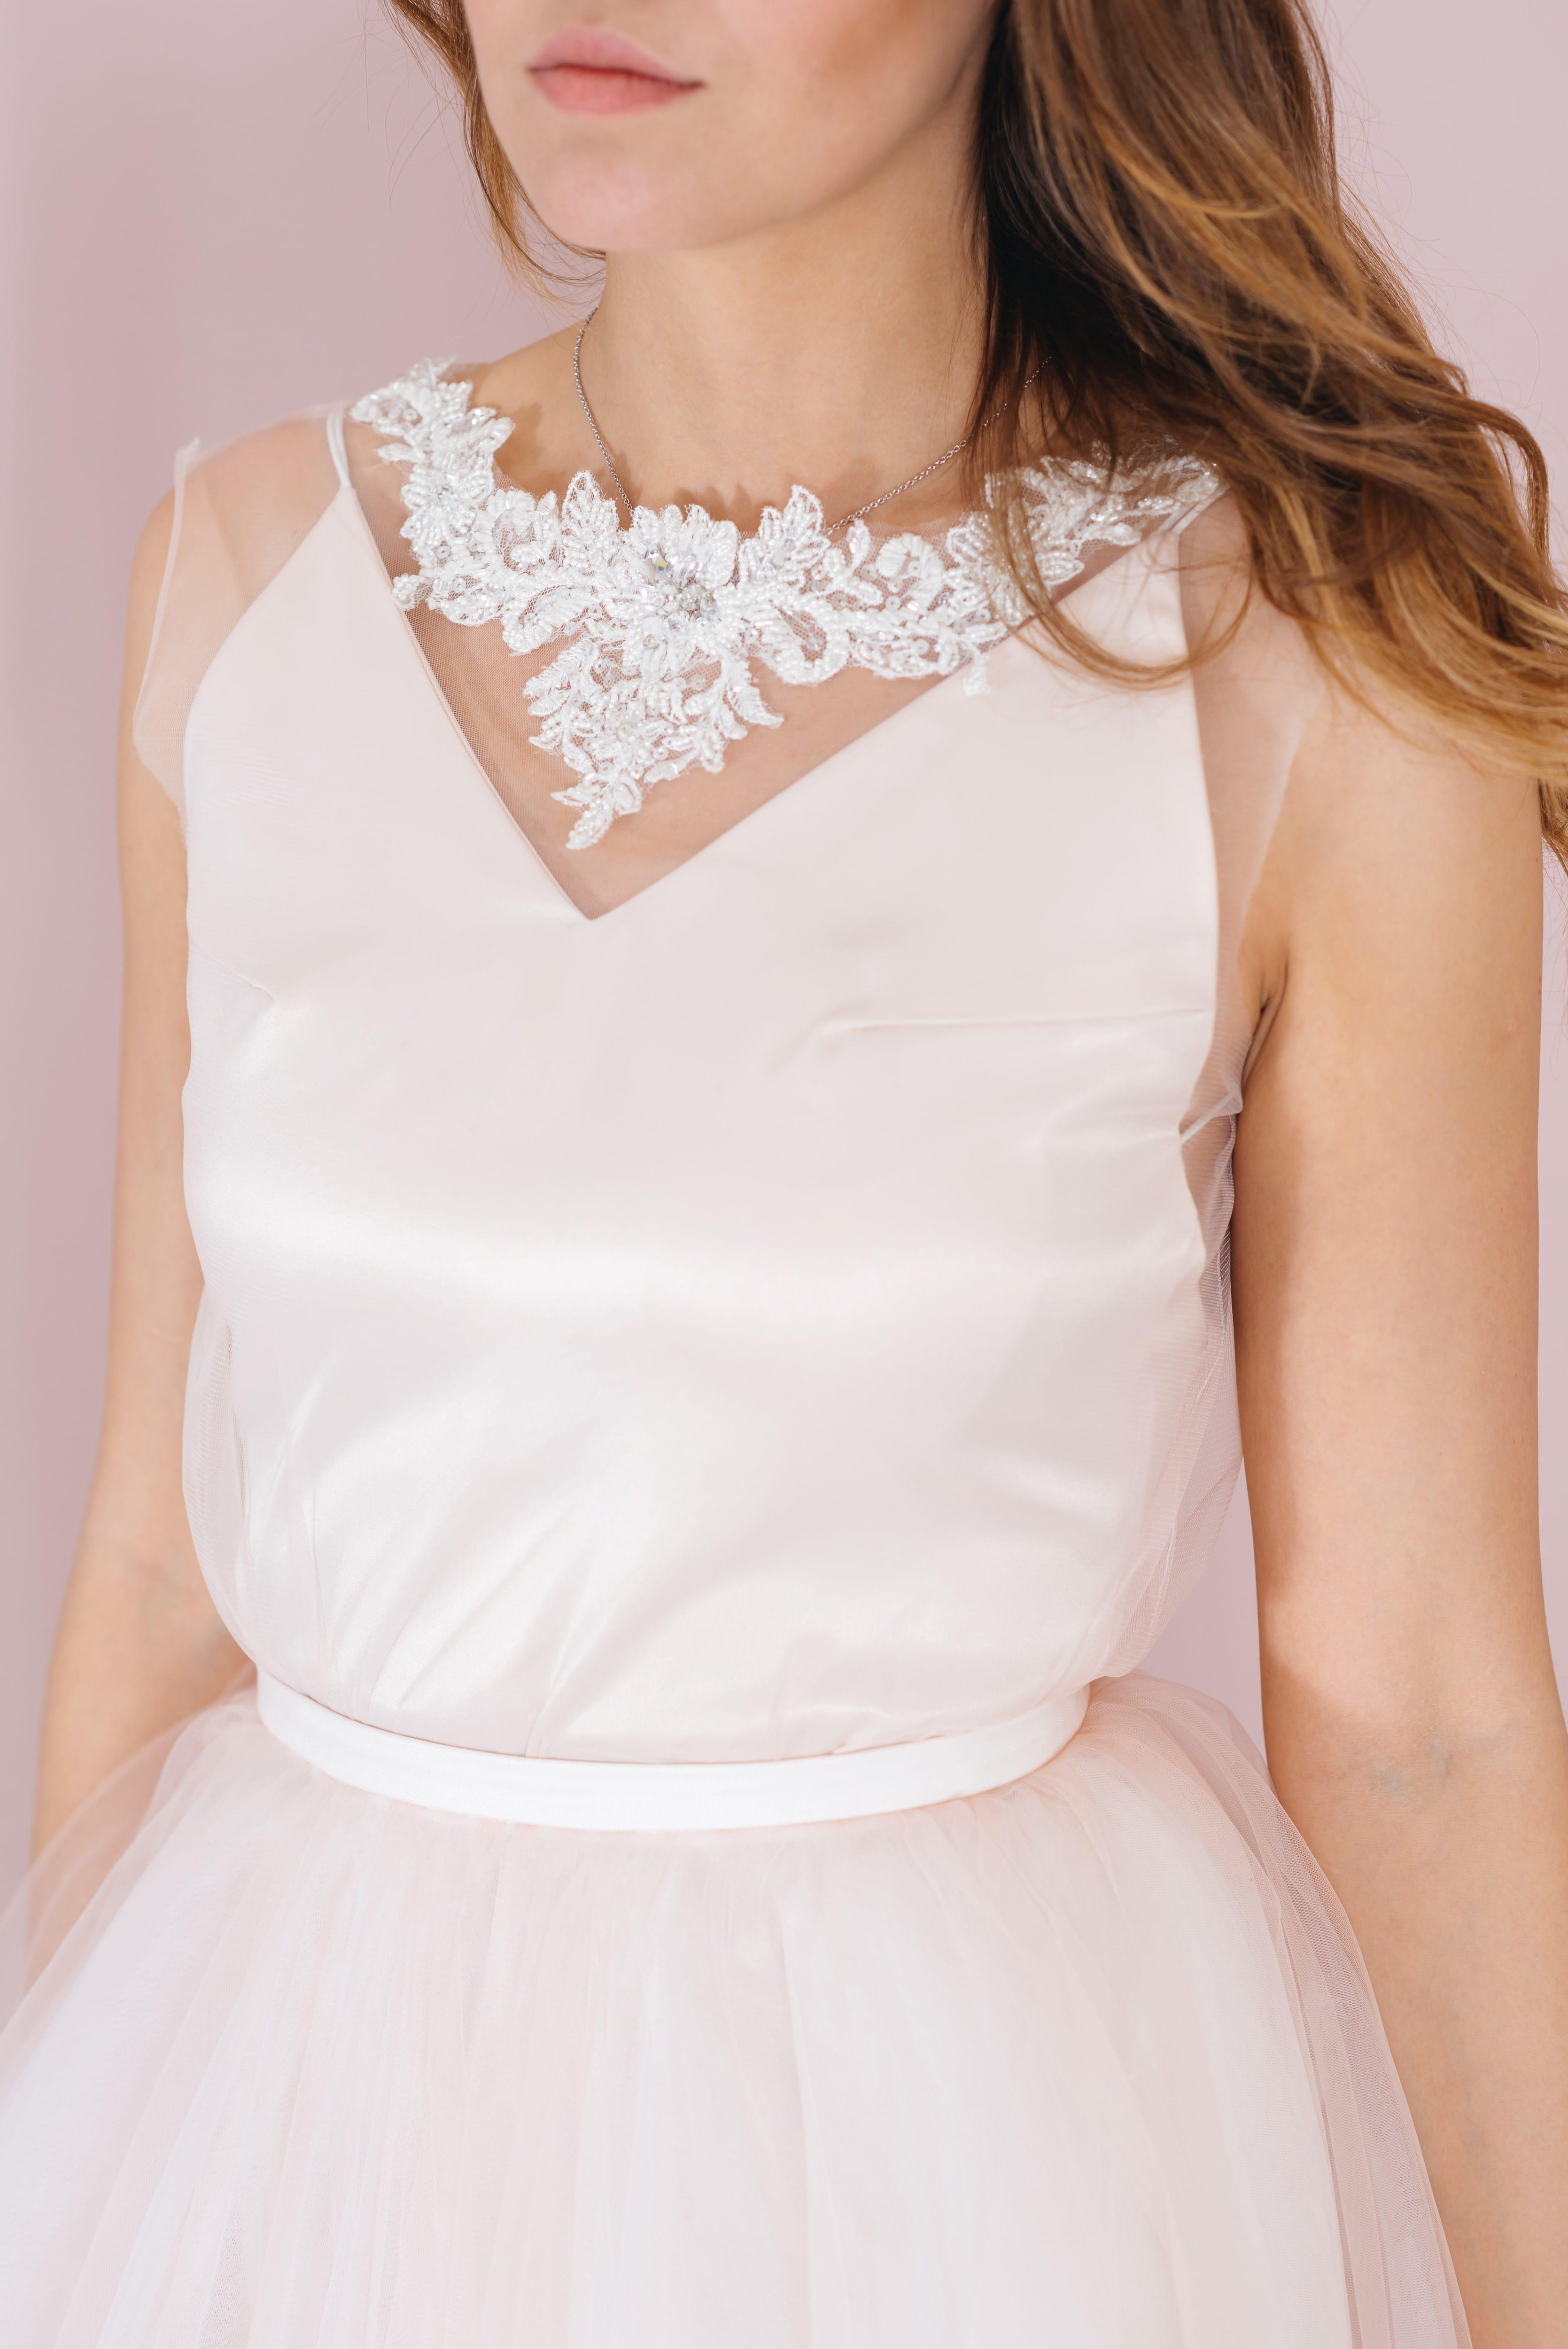 Свадебное платье HARMONY, коллекция LOFT, бренд RARE BRIDAL, фото 4